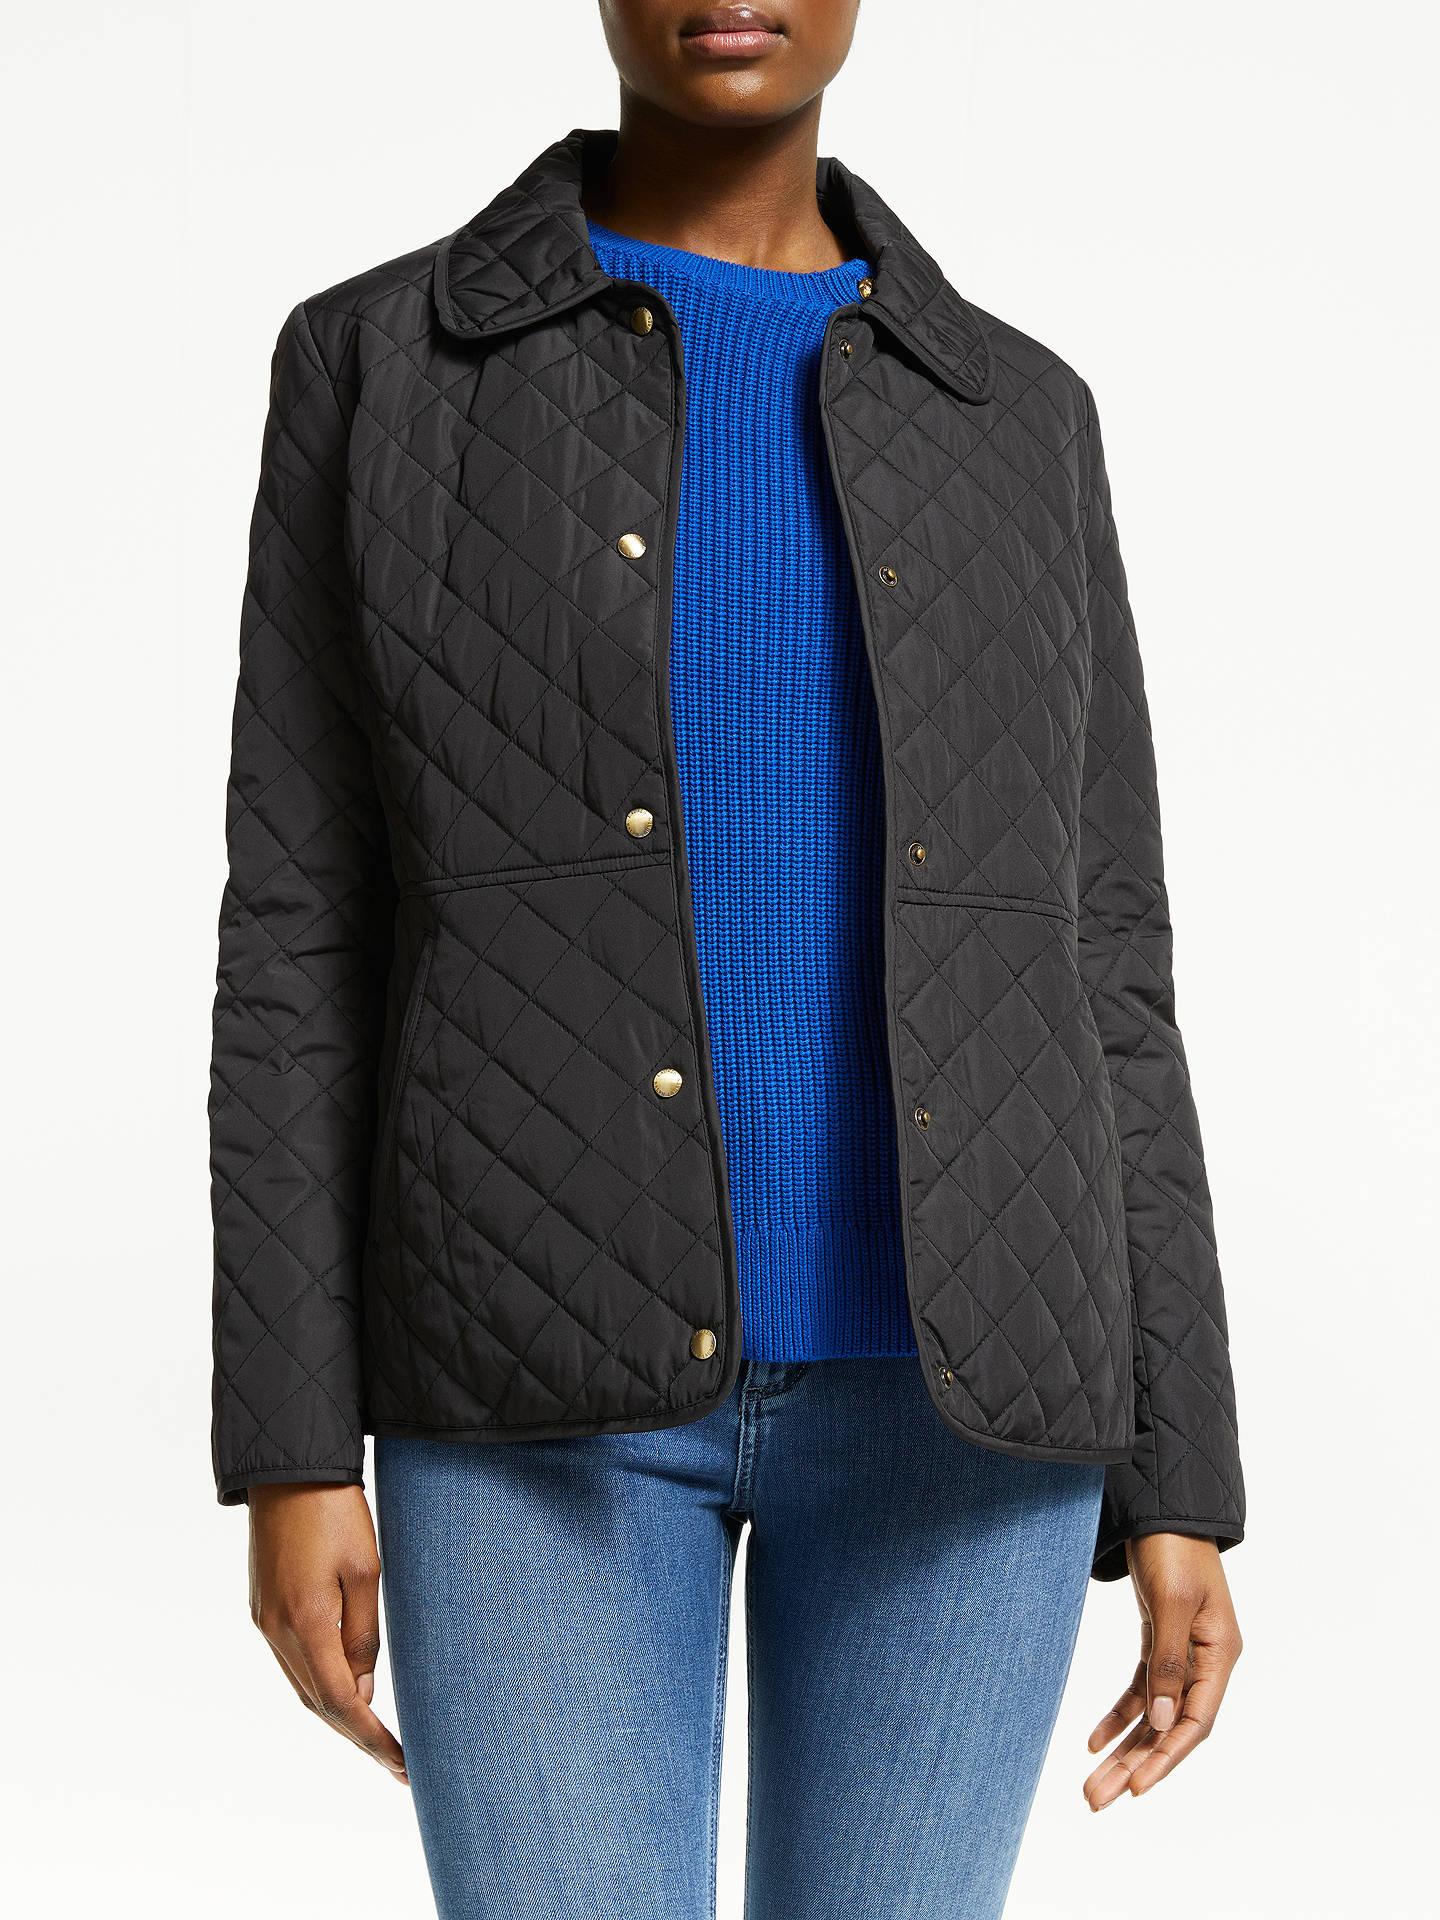 c2f6dafb7e2c Buy Lauren Ralph Lauren Quilted Jacket, Black, L Online at johnlewis.com ...